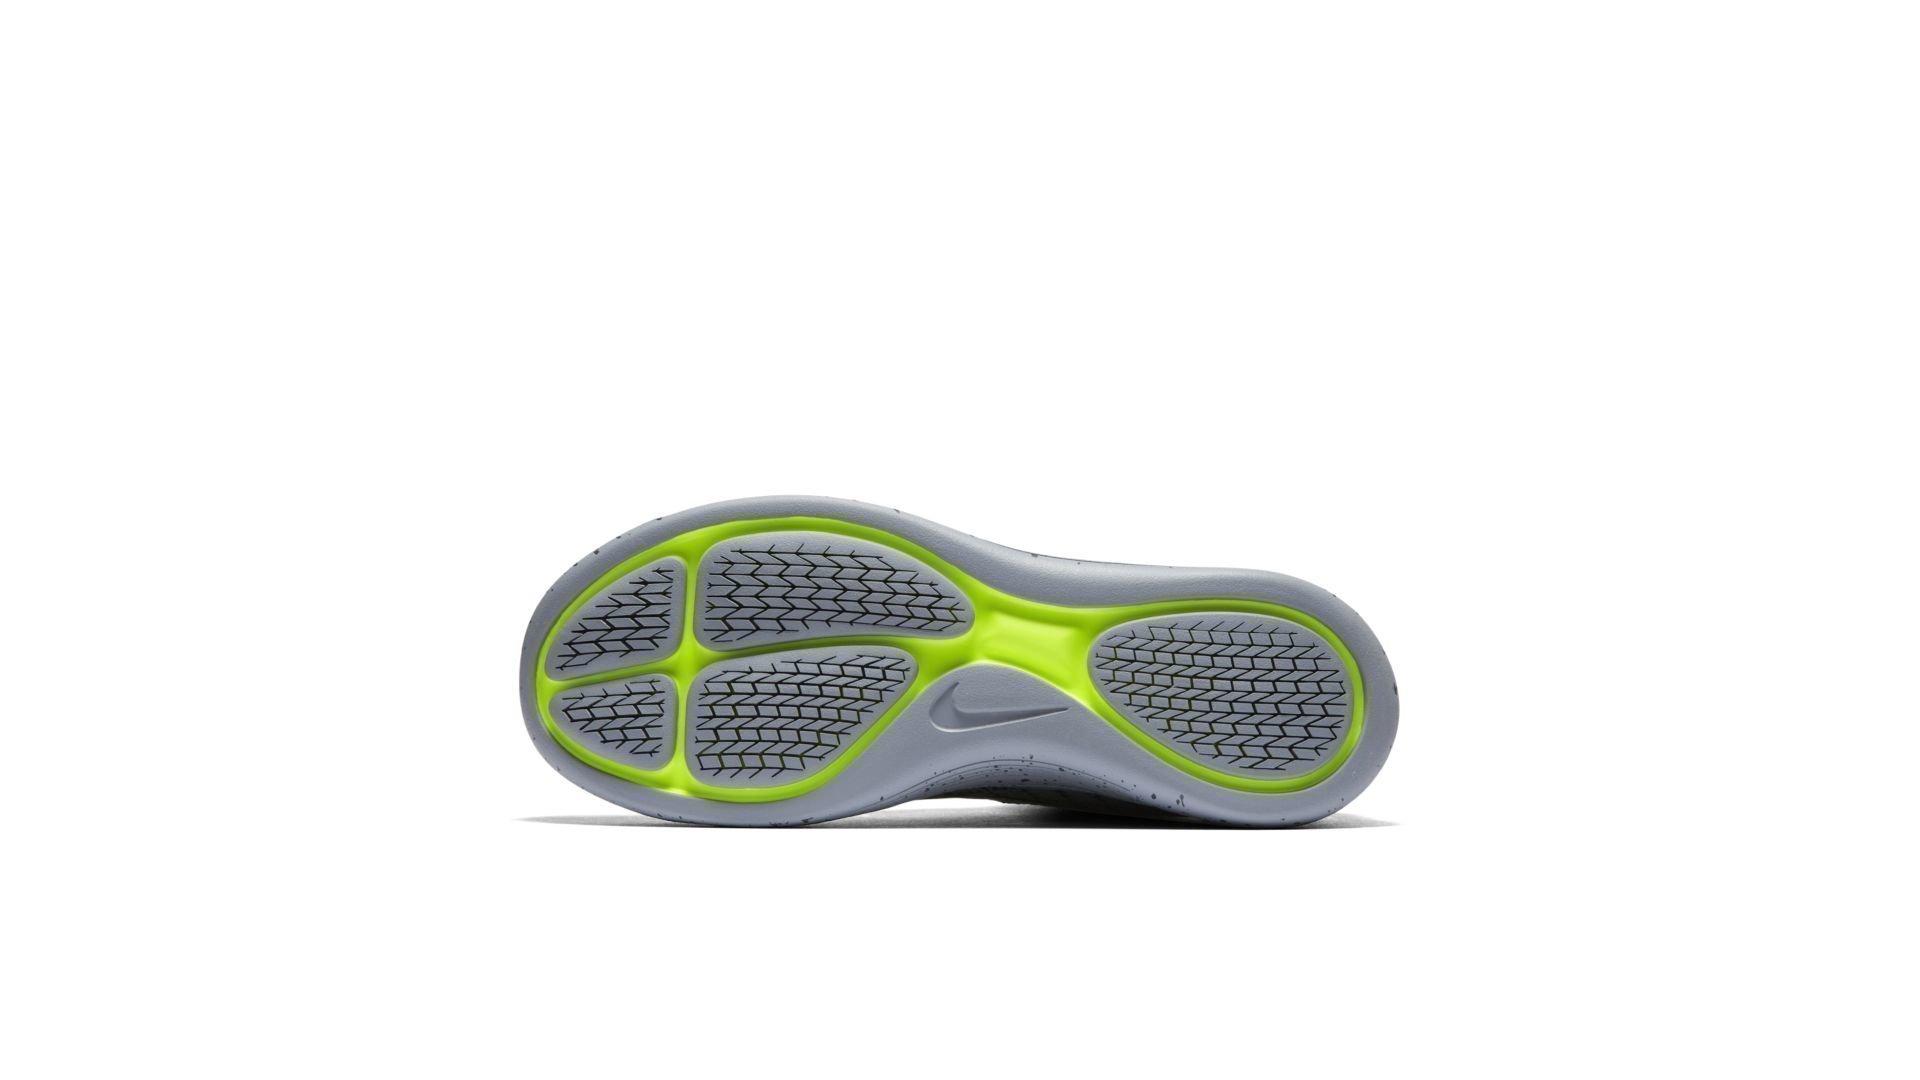 Nike Lunarepic Flyknit Shield Black Silver Volt (W) (849665-001)